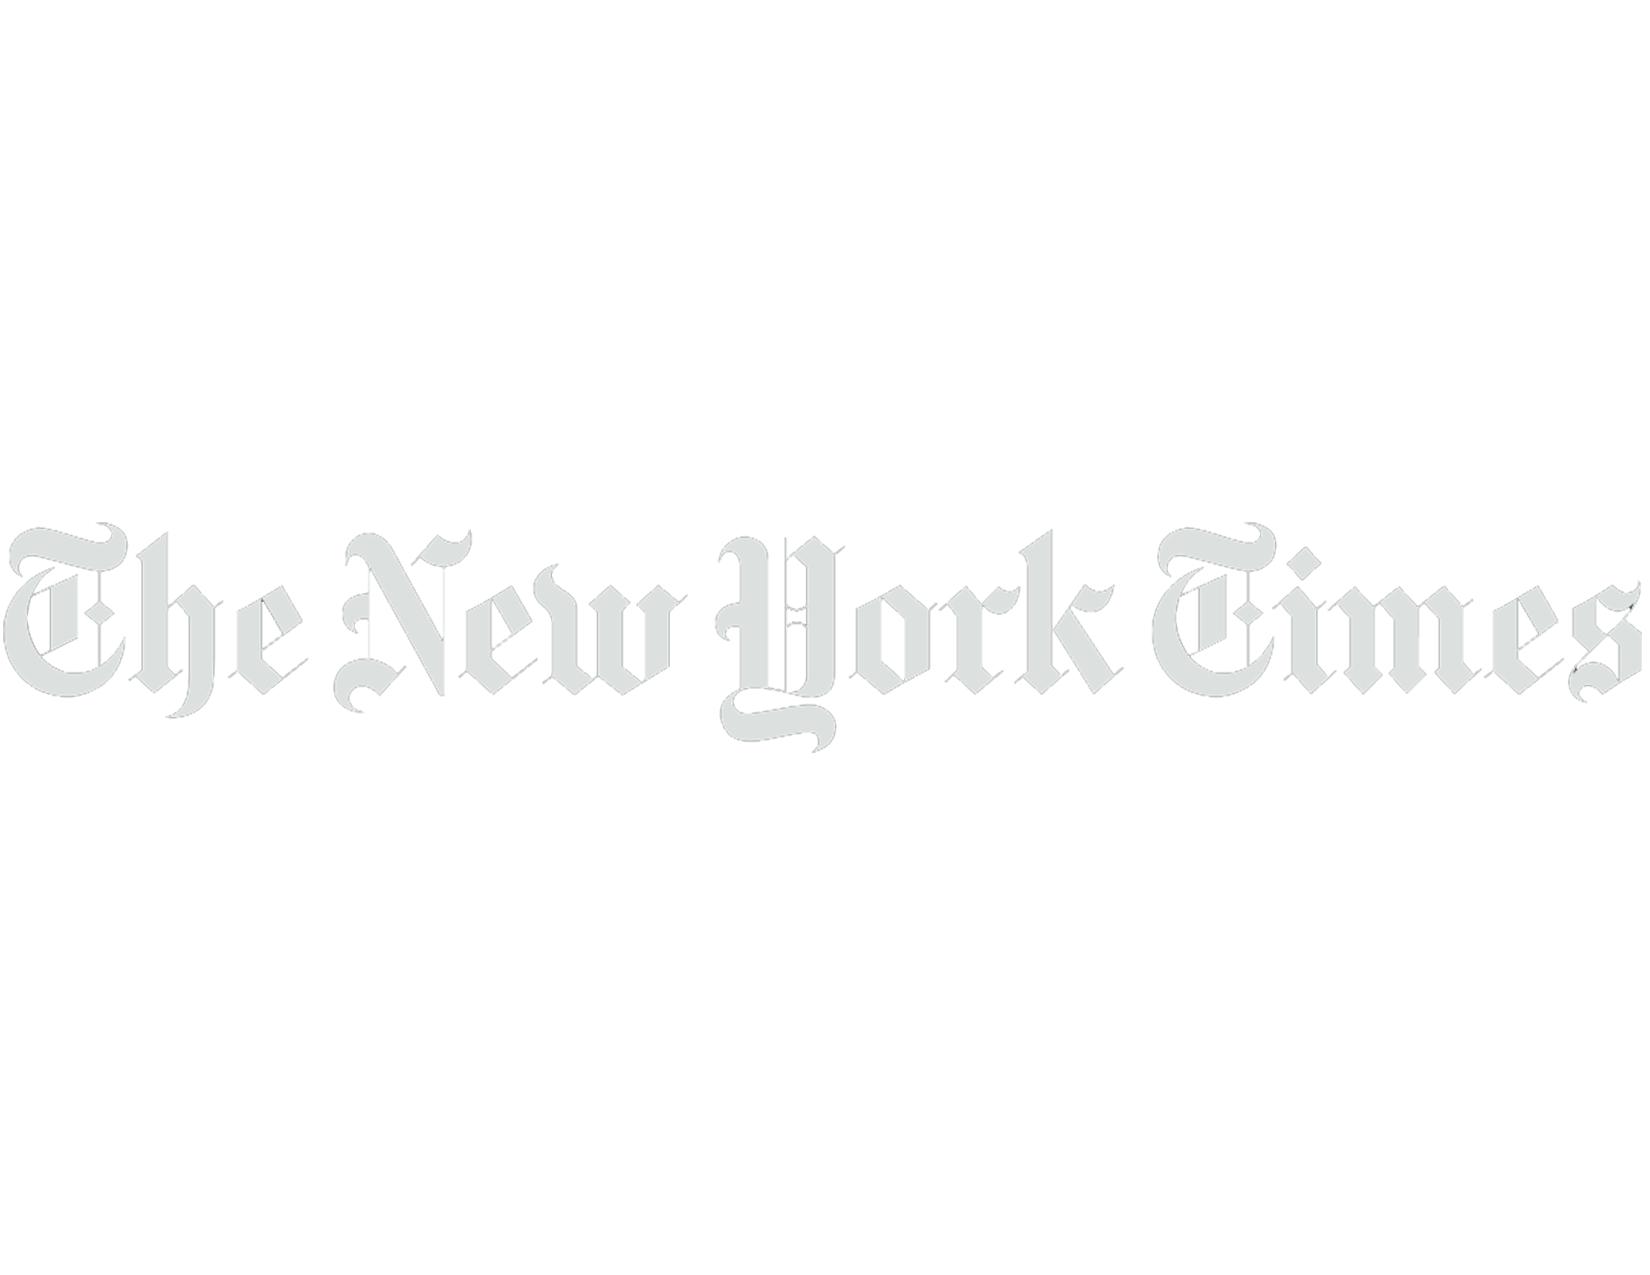 logos-white-1_0017_The_New_York_Times_logo.png